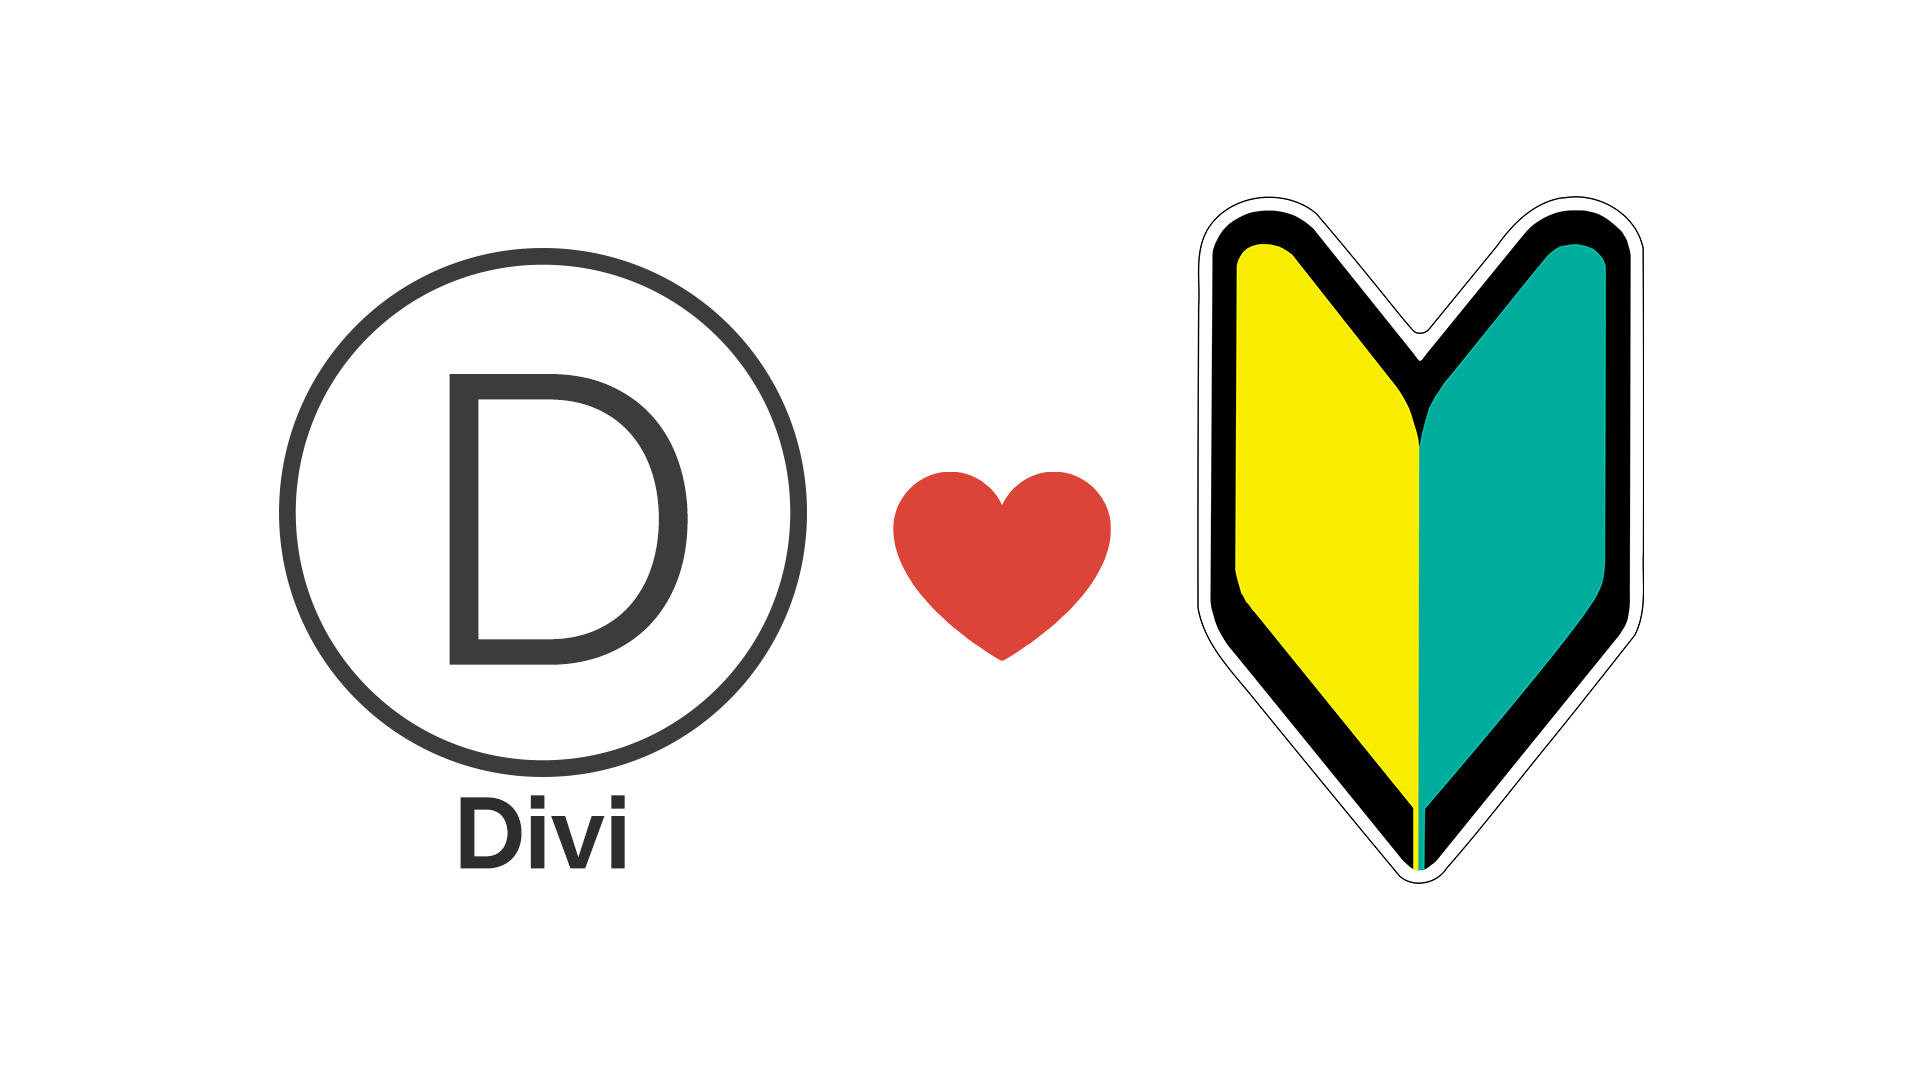 Diviの使い方、Diviは初心者向け